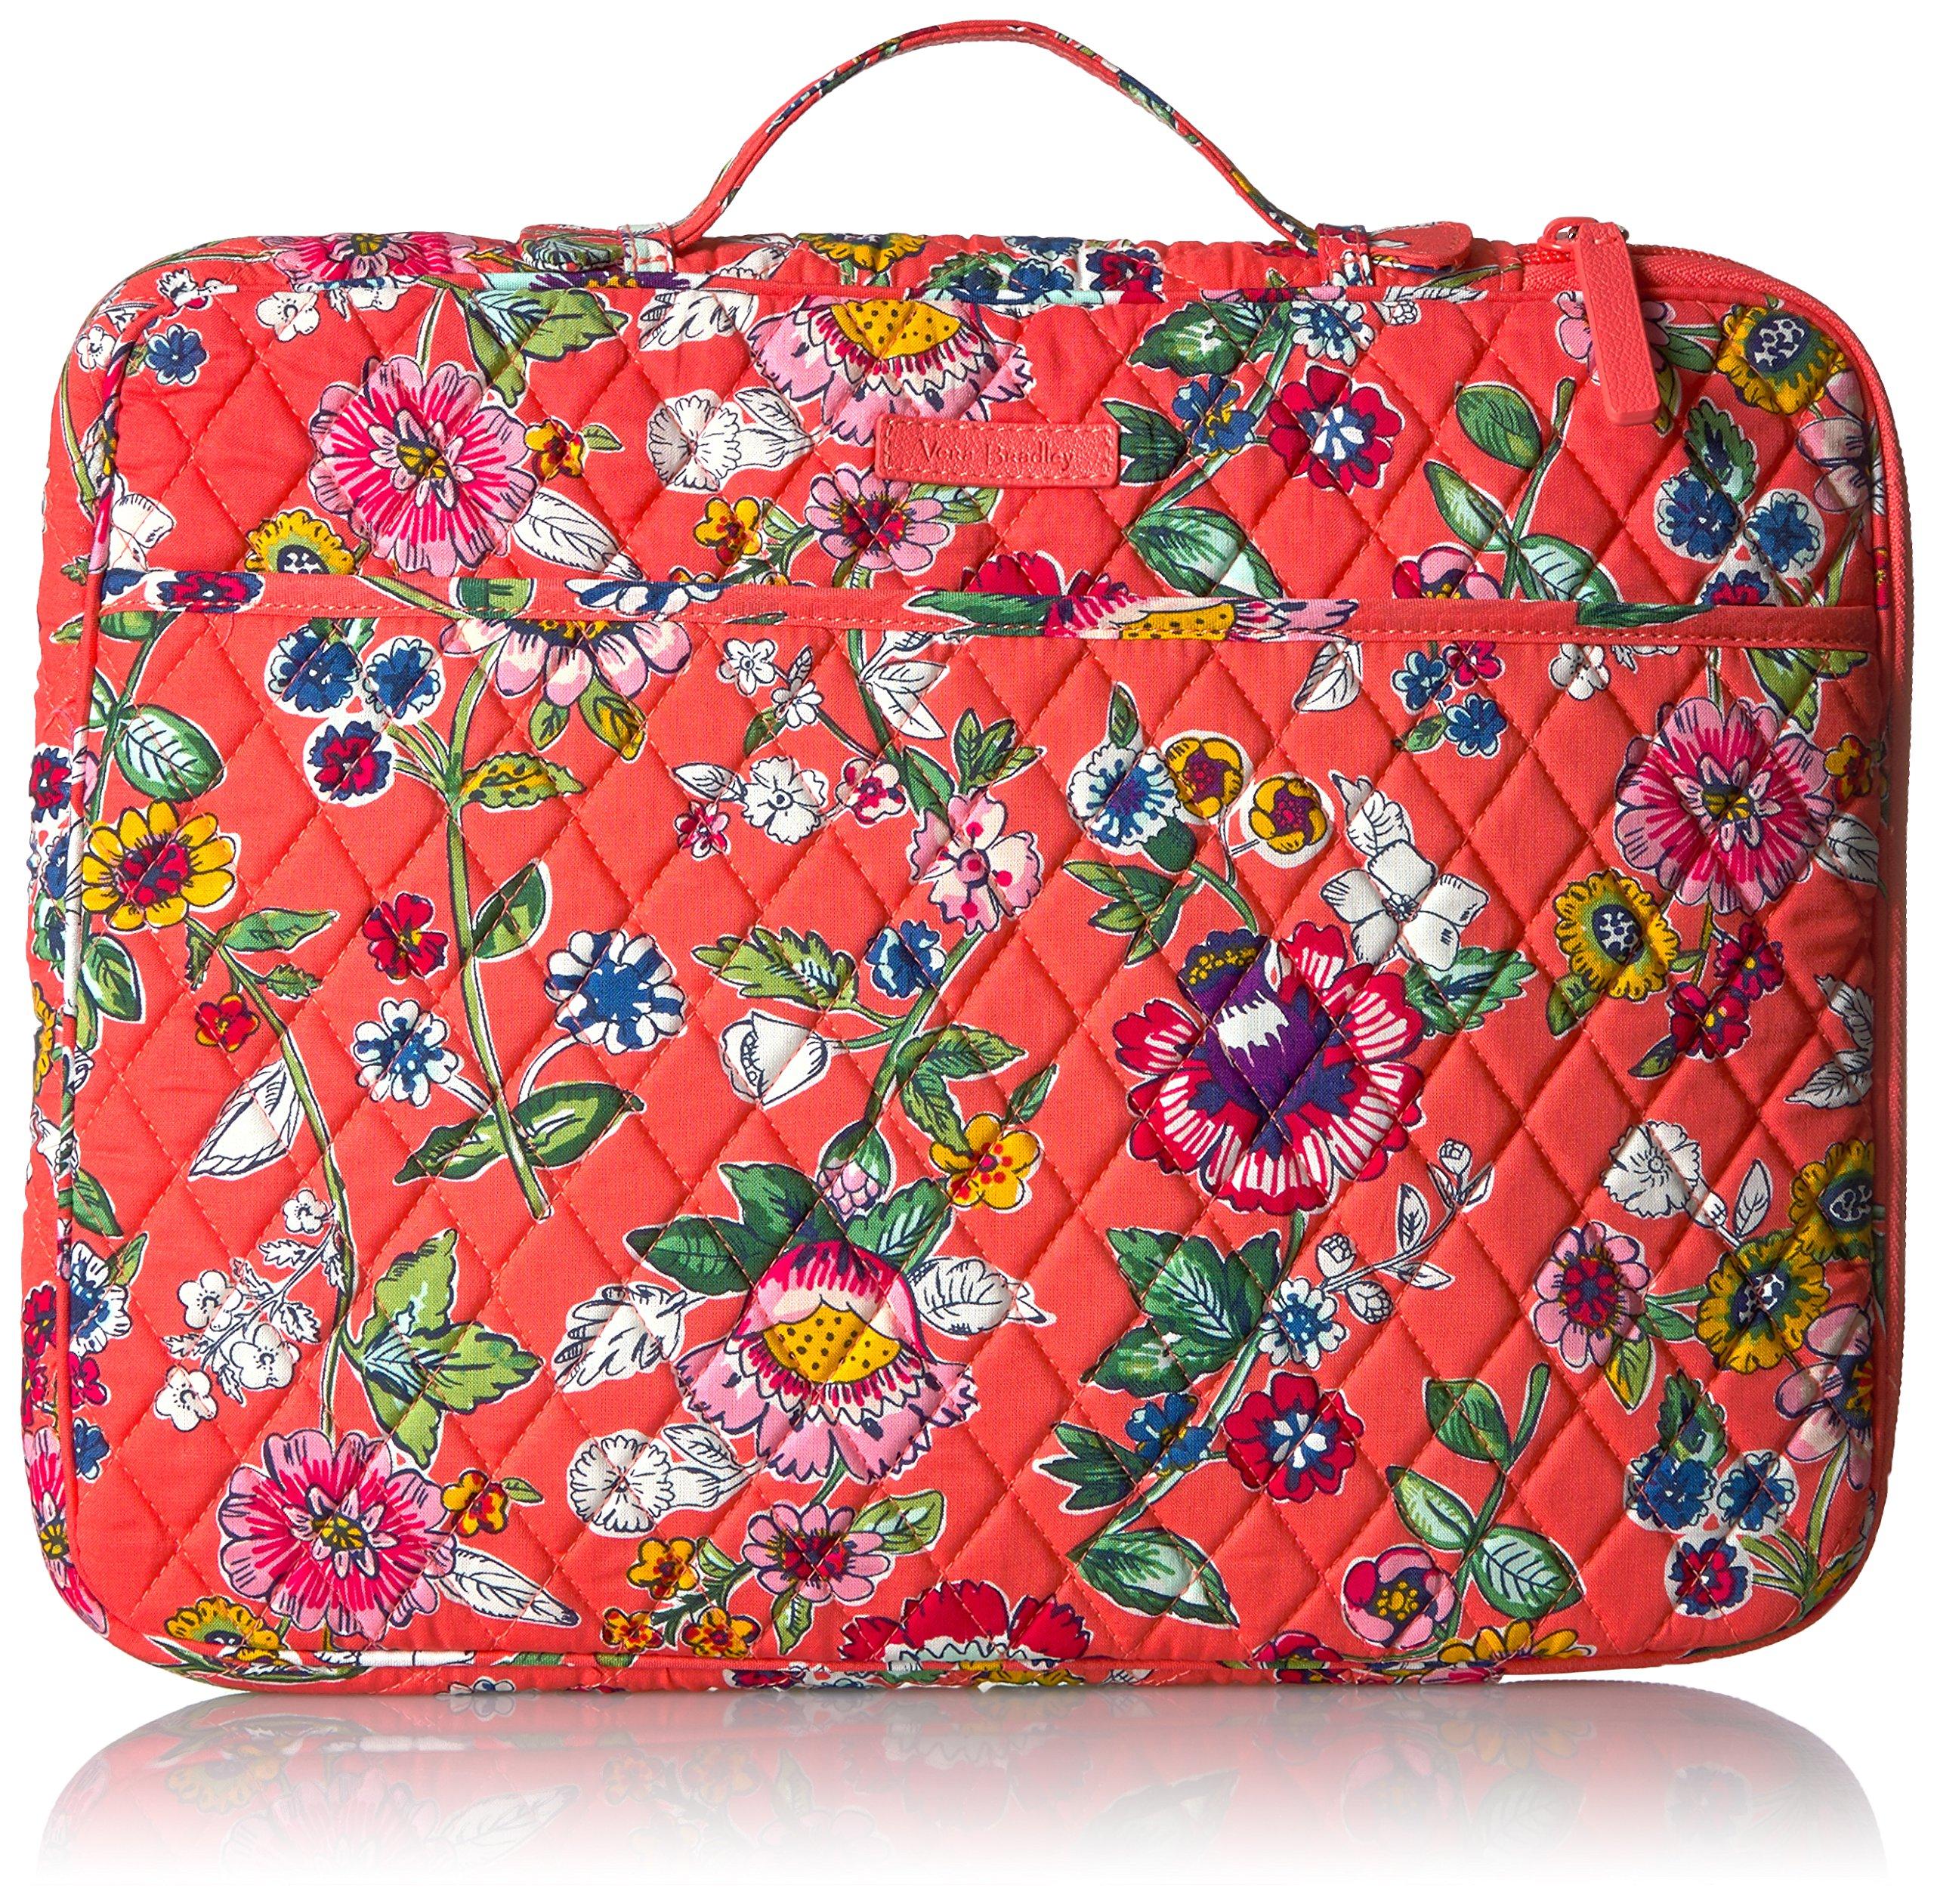 Laptop Organizer - Signature Messenger Bag Bag, Coral Floral, One Size